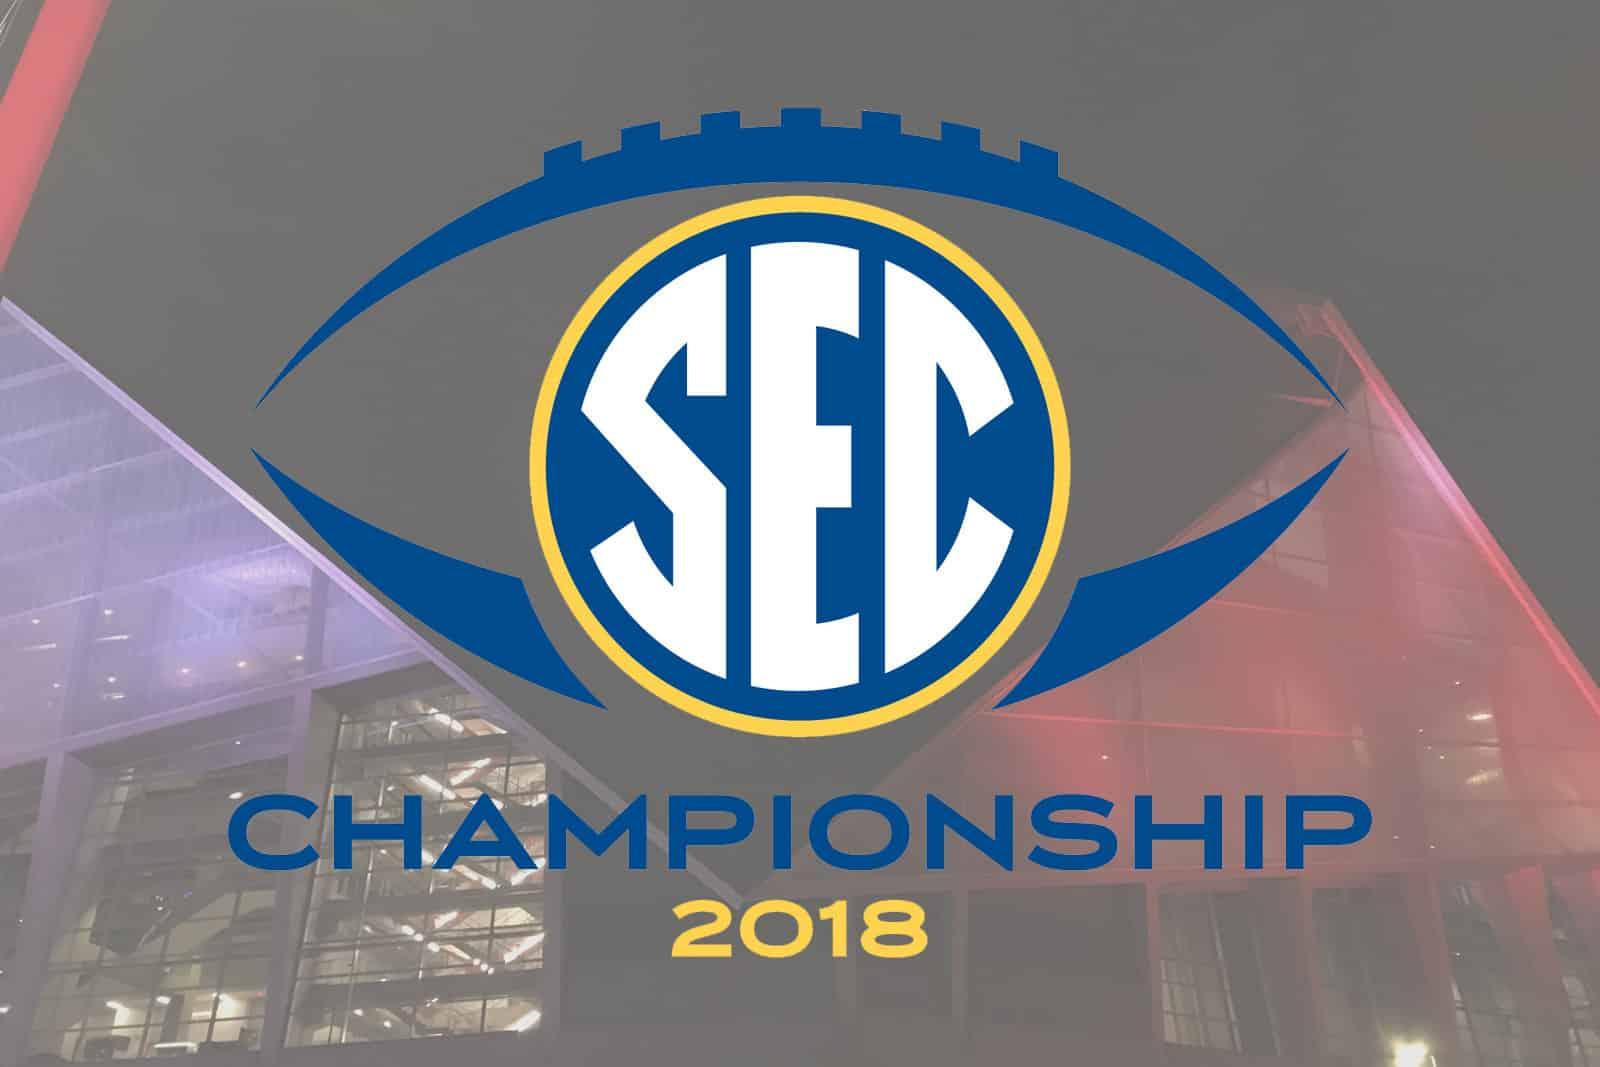 2018 SEC Championship Game